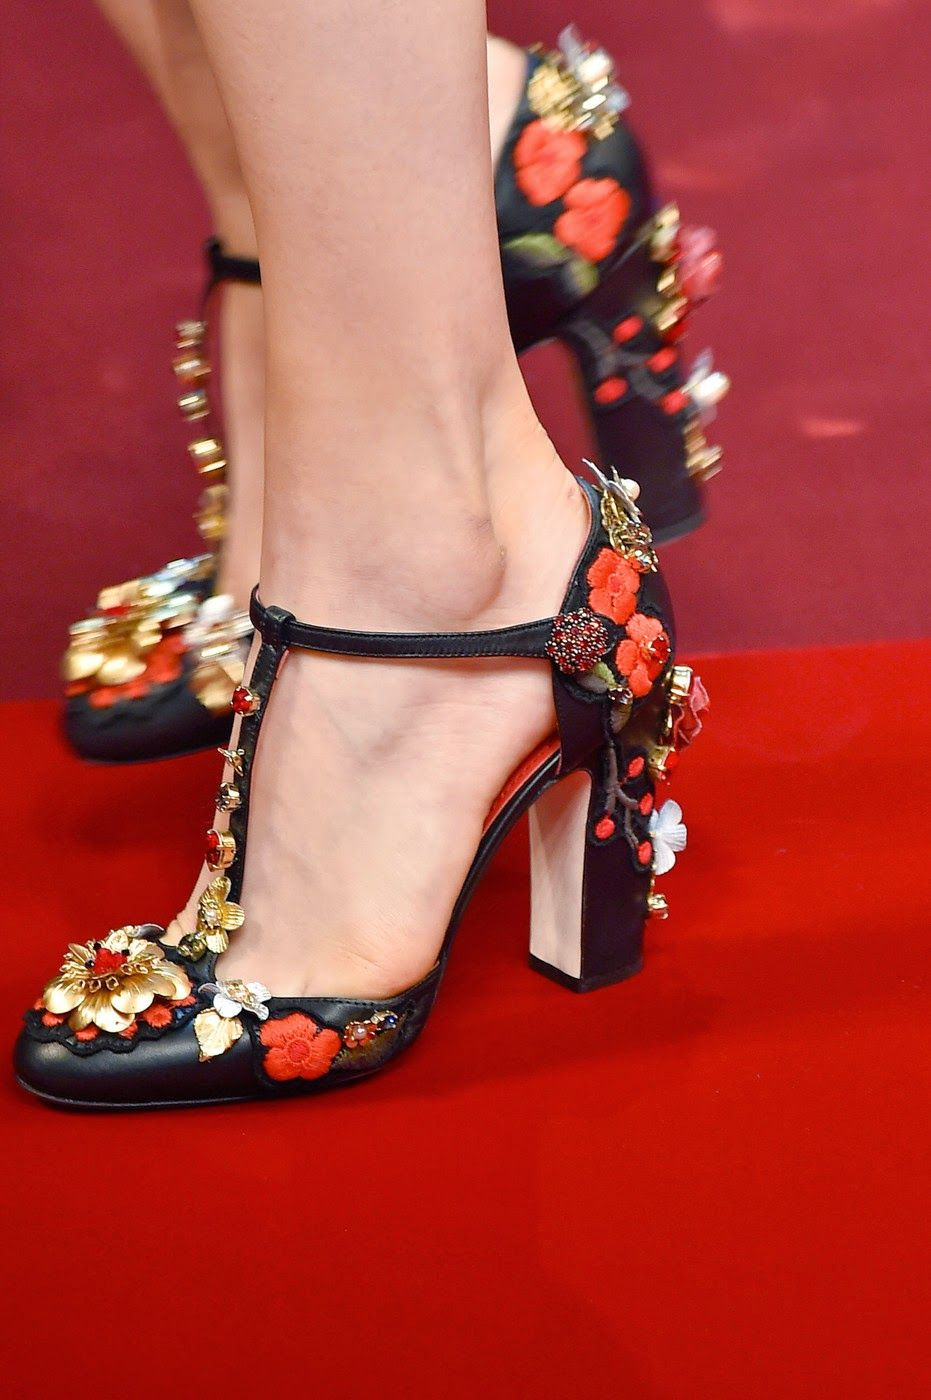 Коллекции Dolce amp; Gabbana Лето Обувь Show 2015 Из Fashion Весна ZqAHwB